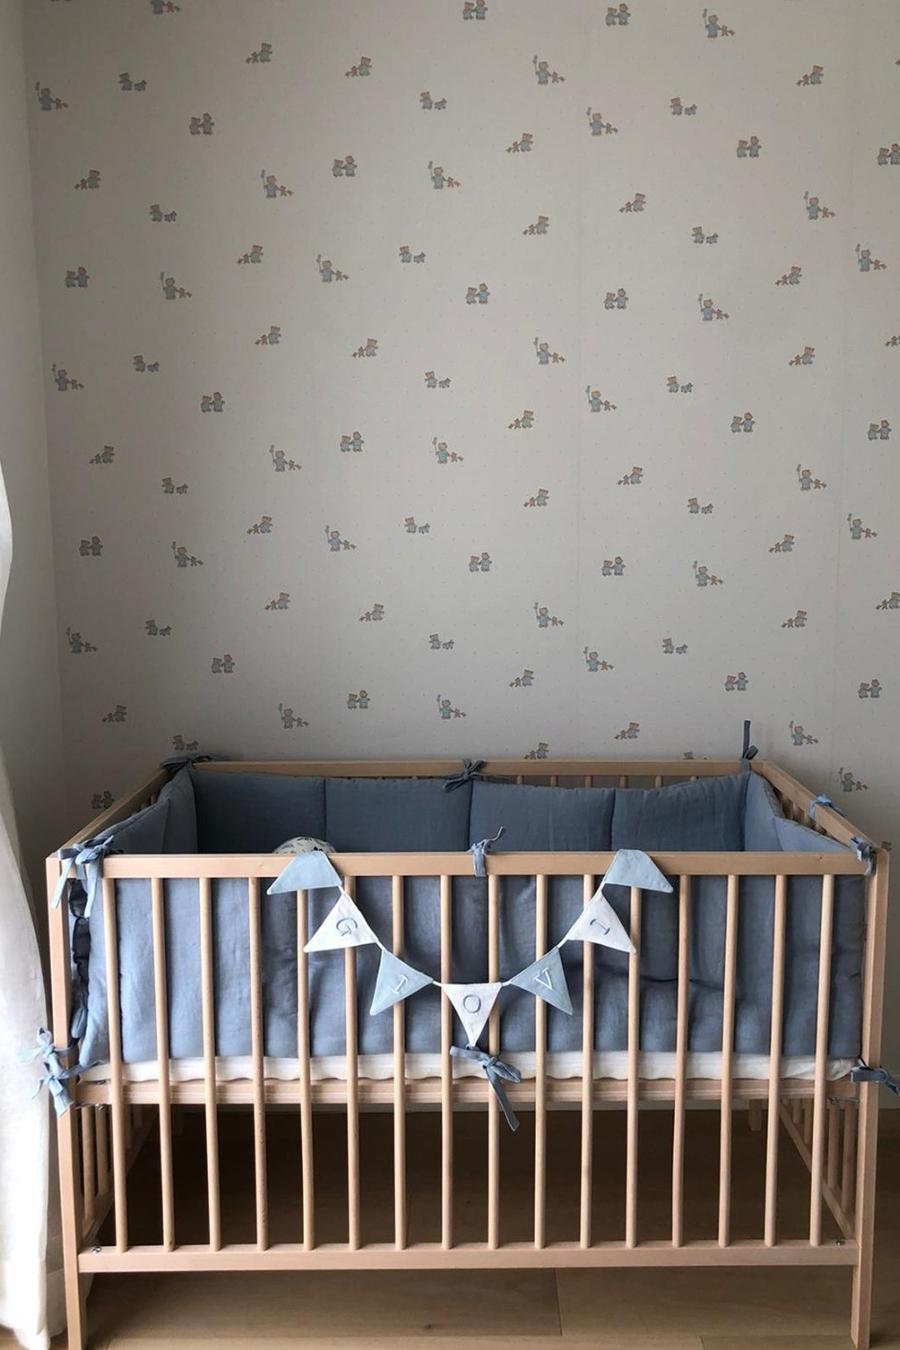 Vibo_wallpaper_Jannelli&Volpi_papierpeint